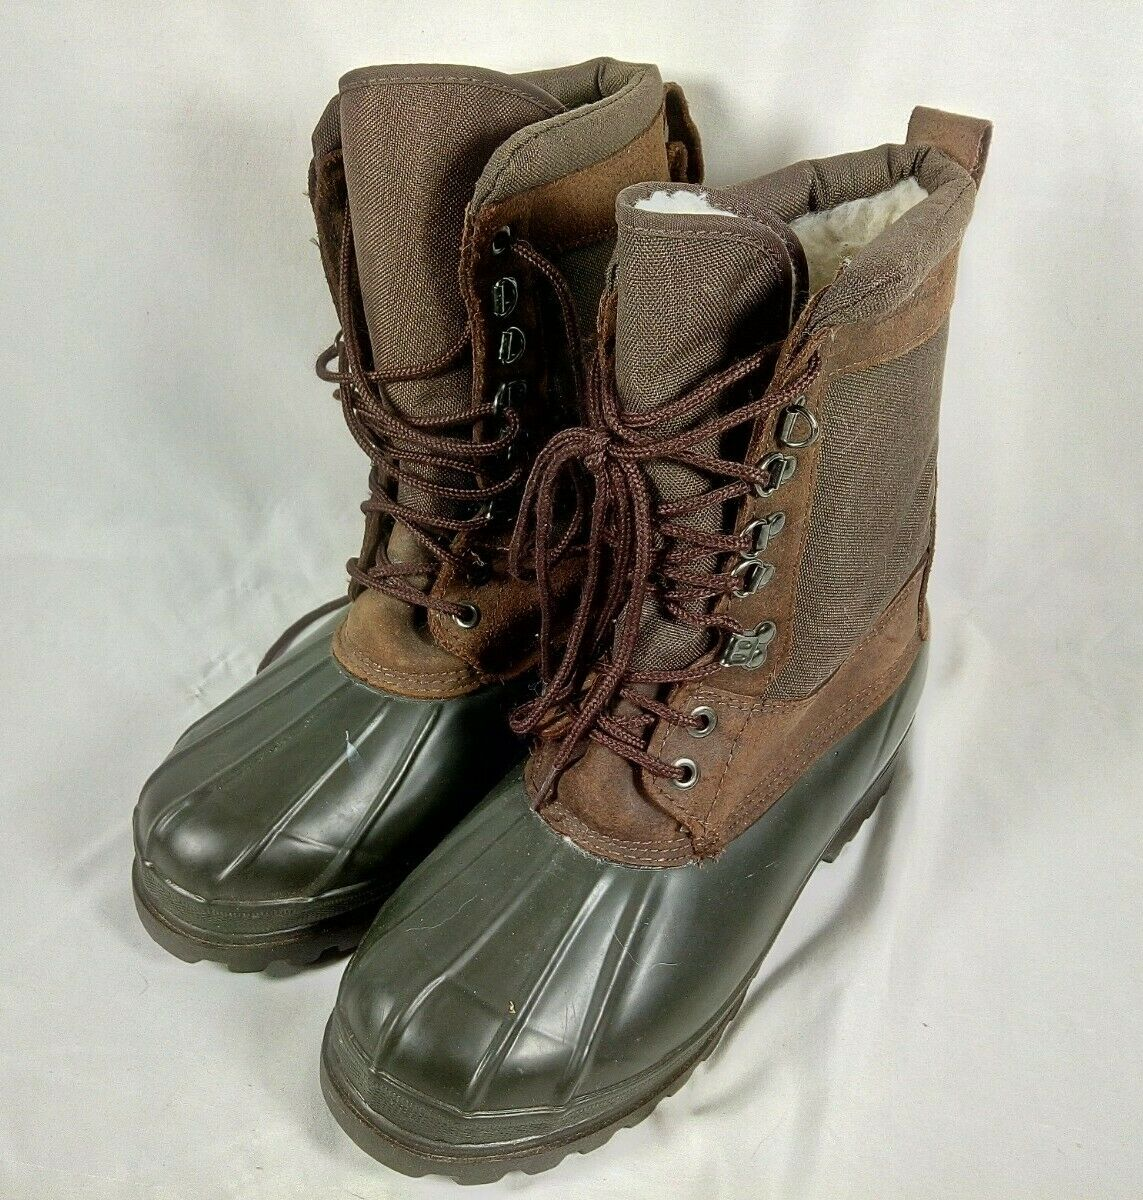 Eddie Bauer Men's Duck Boots Size 10 Waterproof Brown Lace-Up